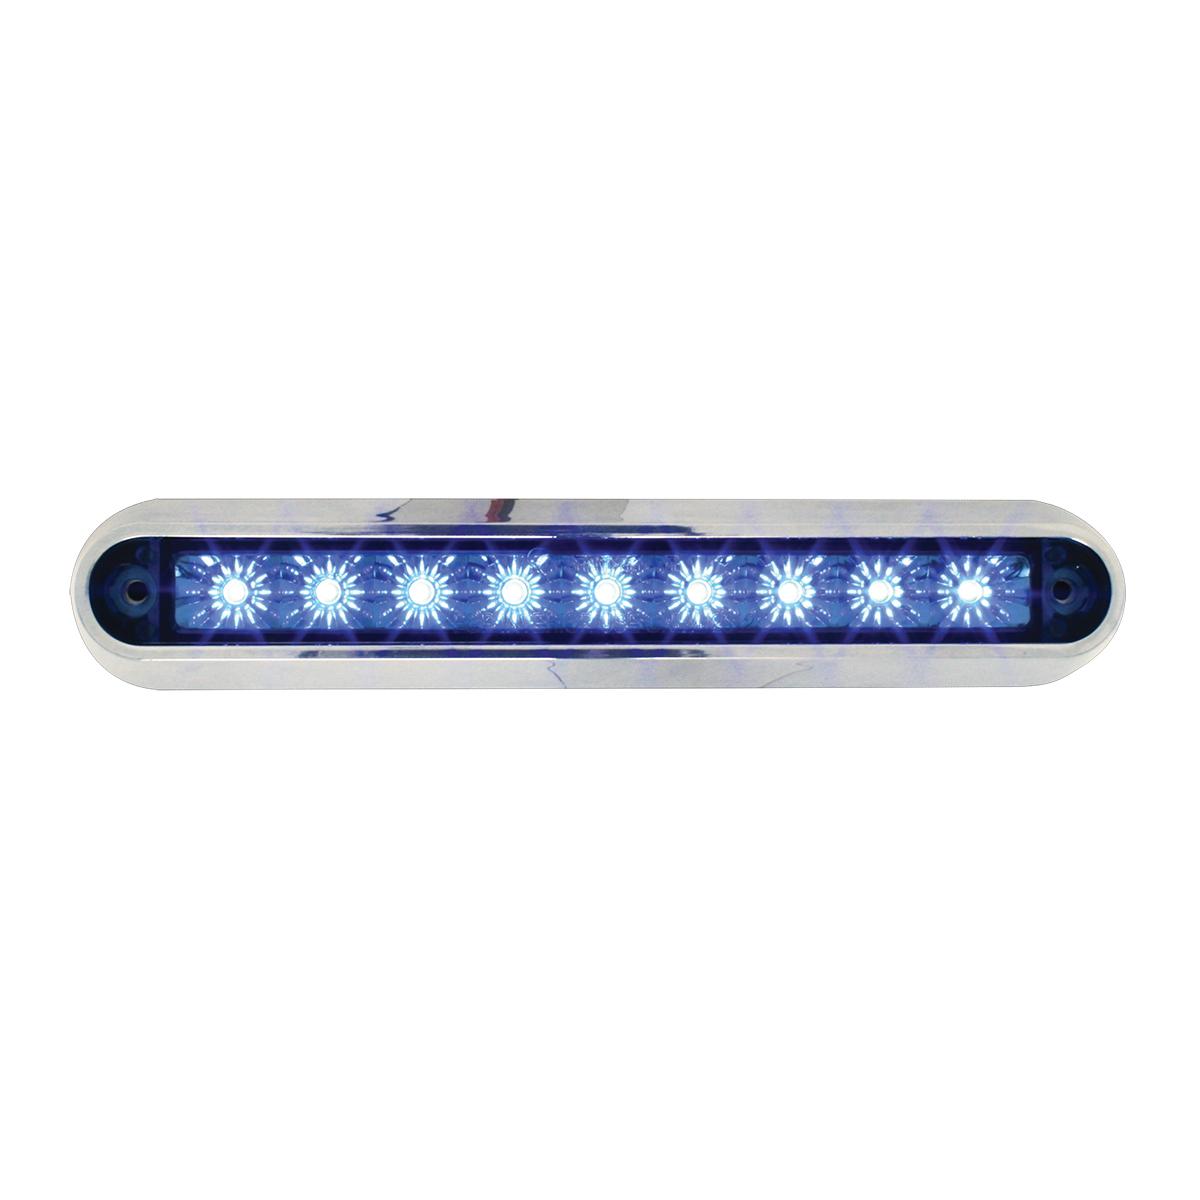 "76095 6.5"" Surface Mount LED Light Bar w/ Chrome Plastic Base"